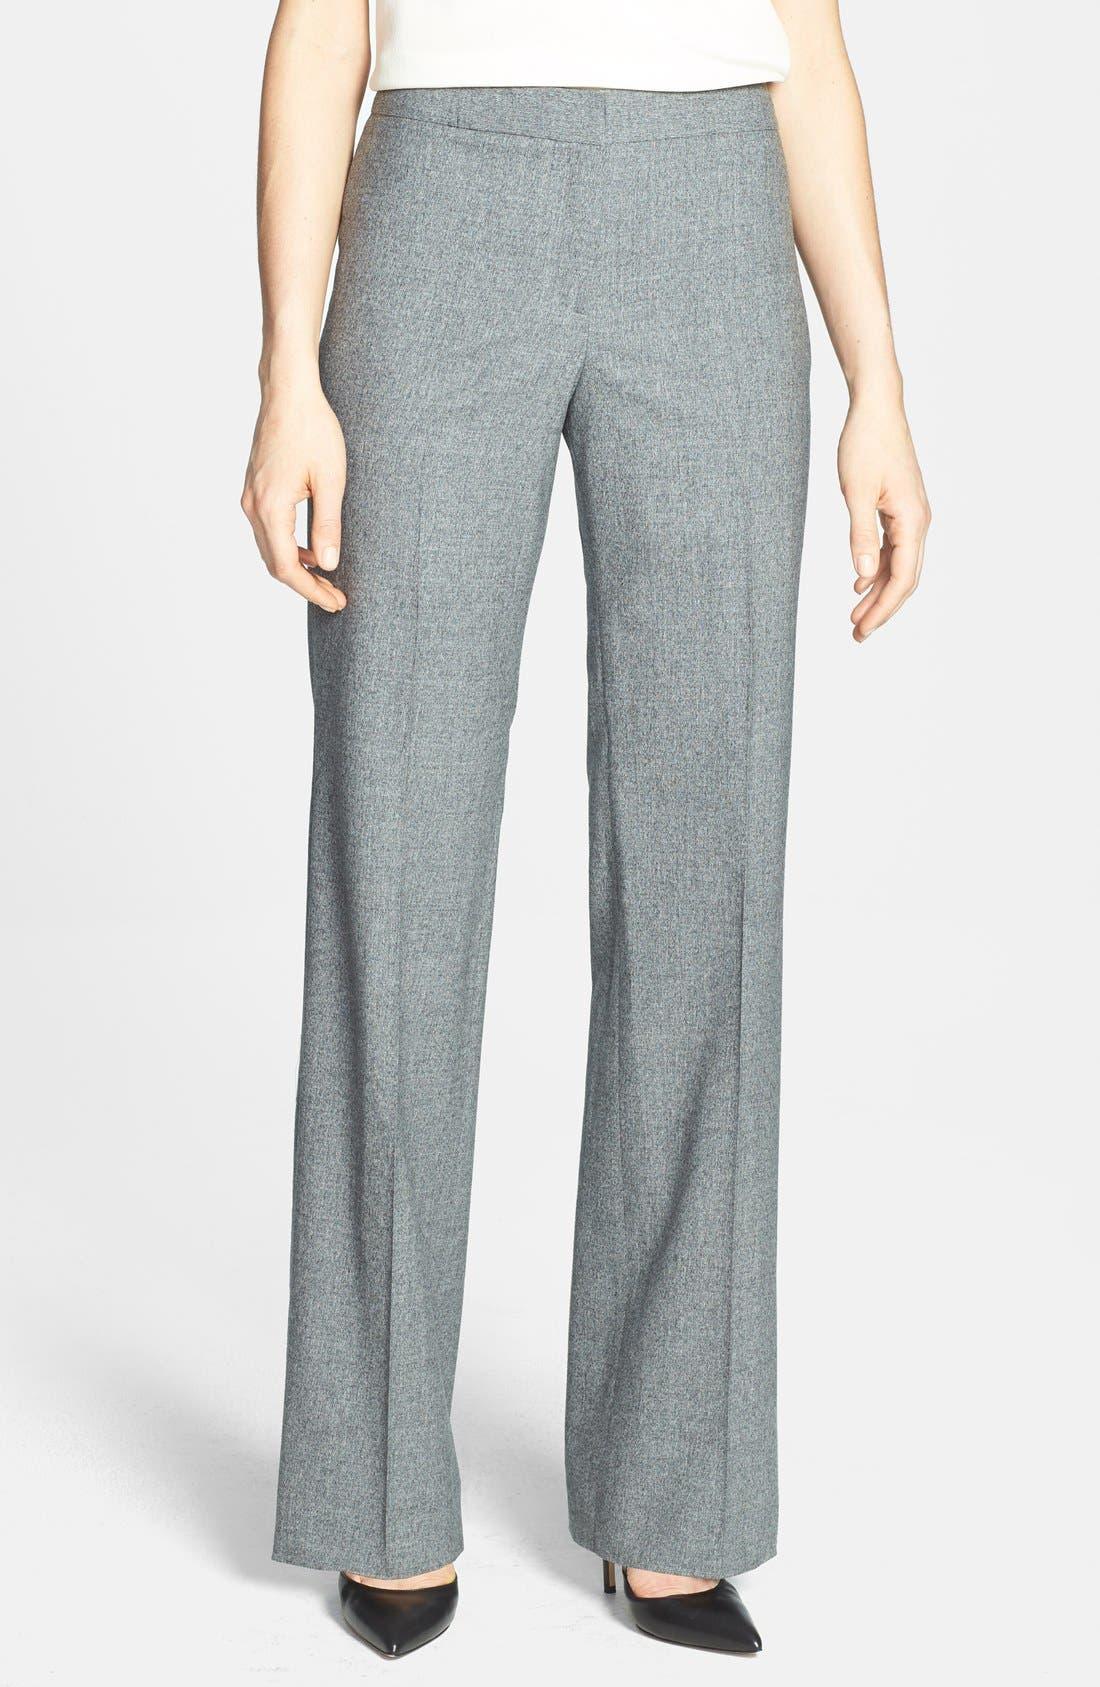 Alternate Image 1 Selected - Santorelli Straight Leg Stretch Wool Suiting Pants